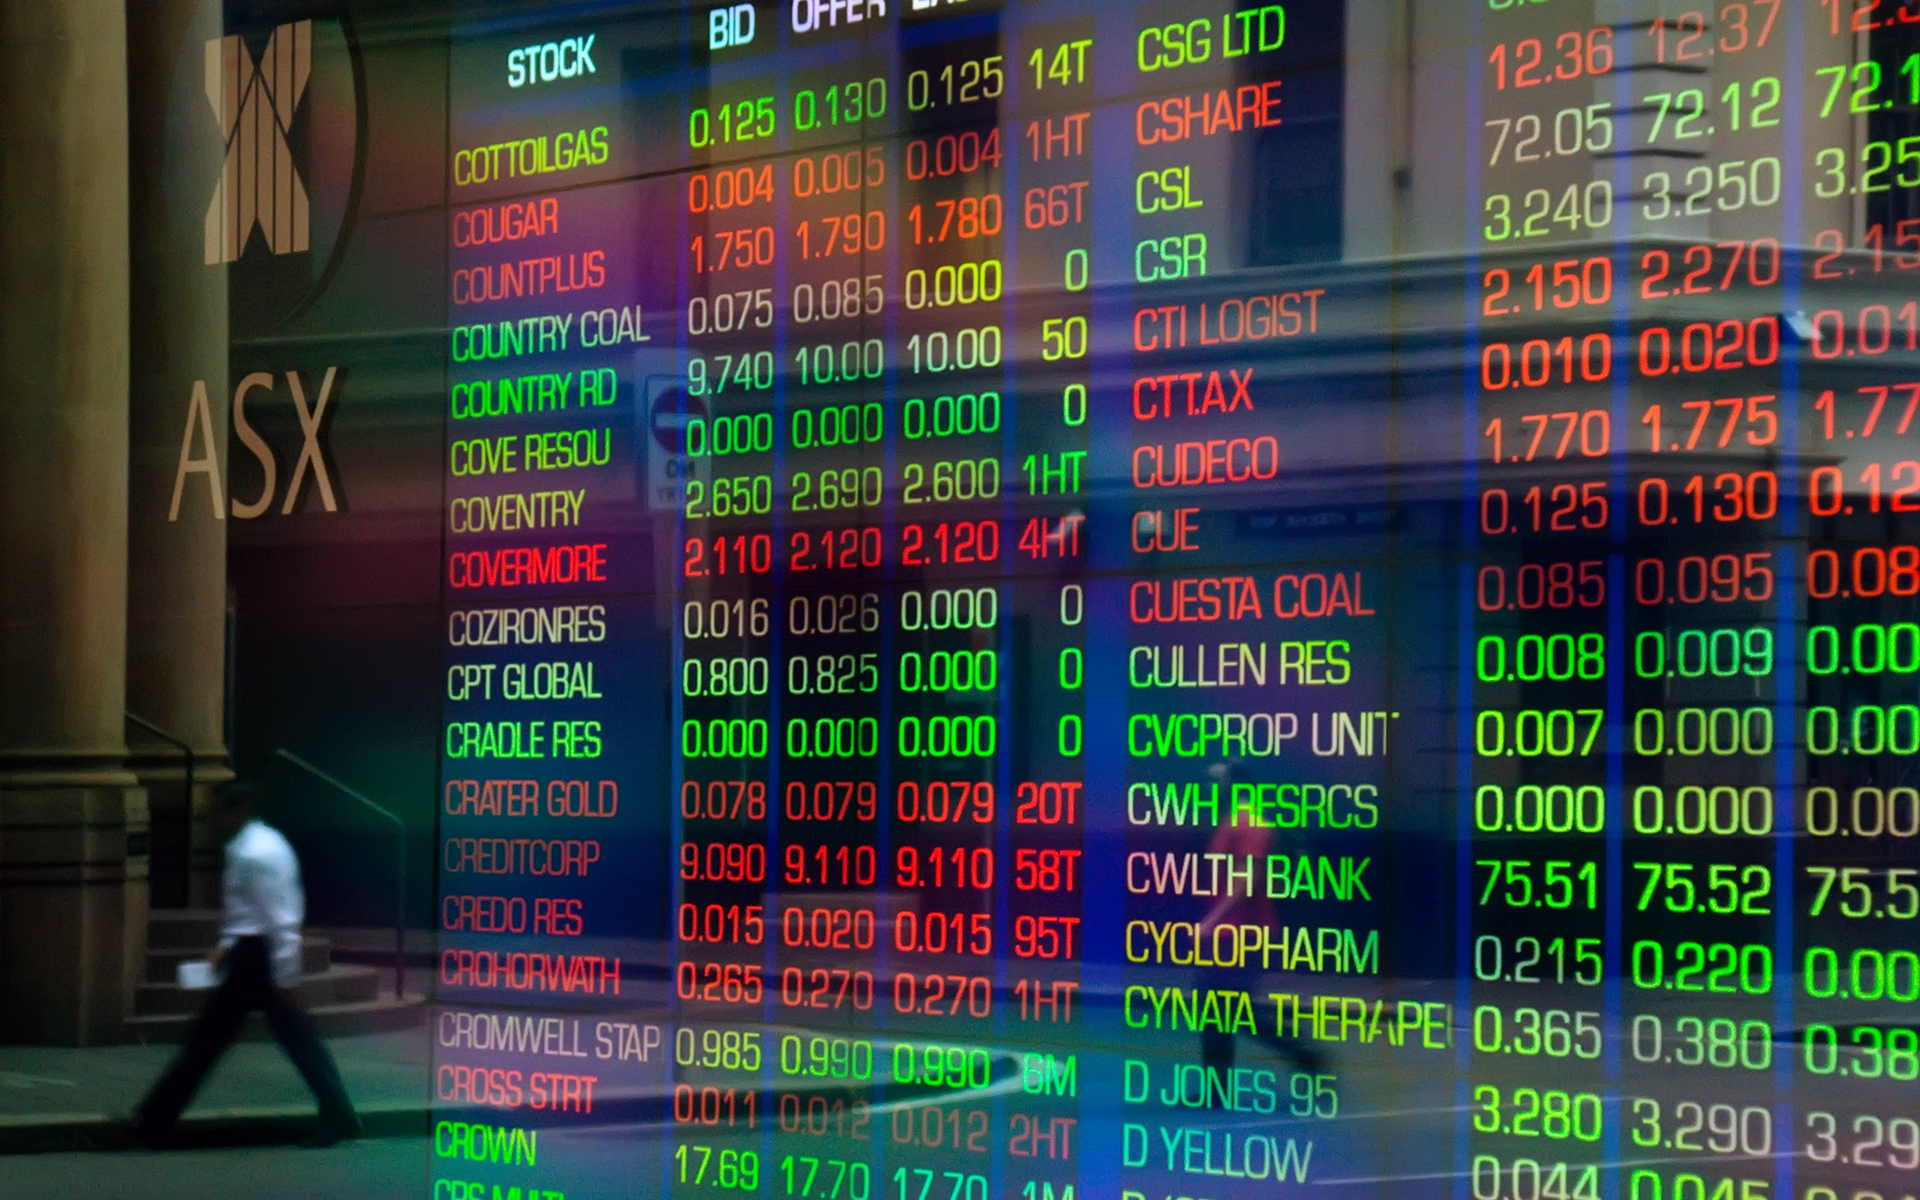 Best Trading Platform Australia - Comparison 🇦🇺